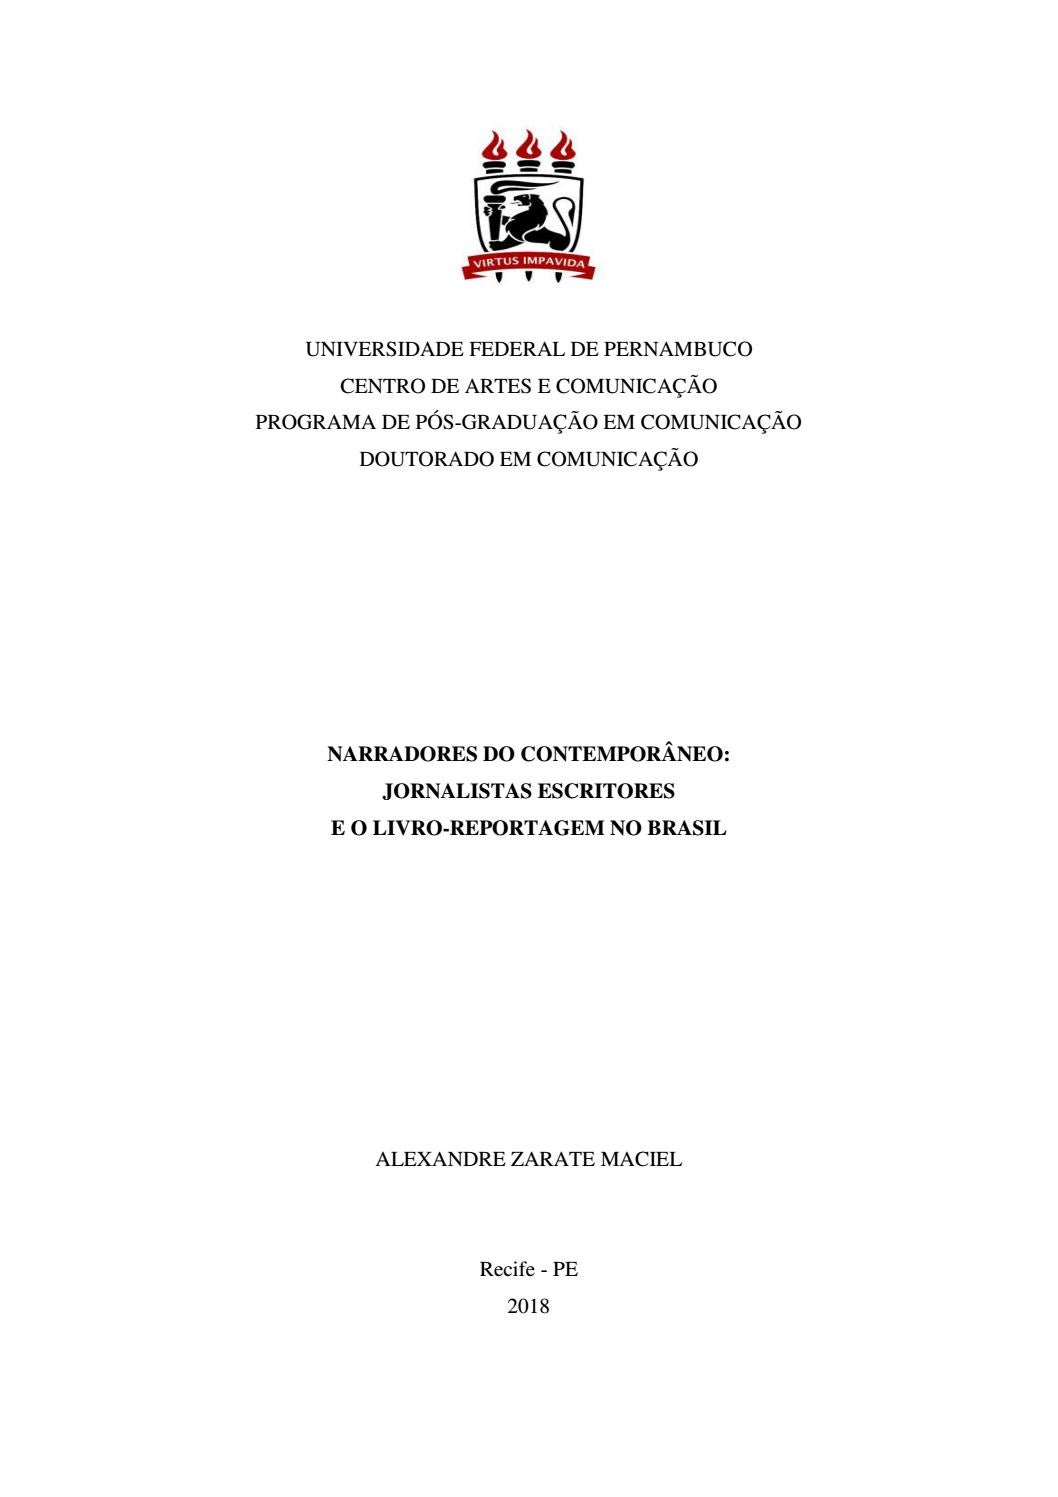 43c78dde2883c Tese alexandre maciel livro reportagem by Edson Silva - issuu